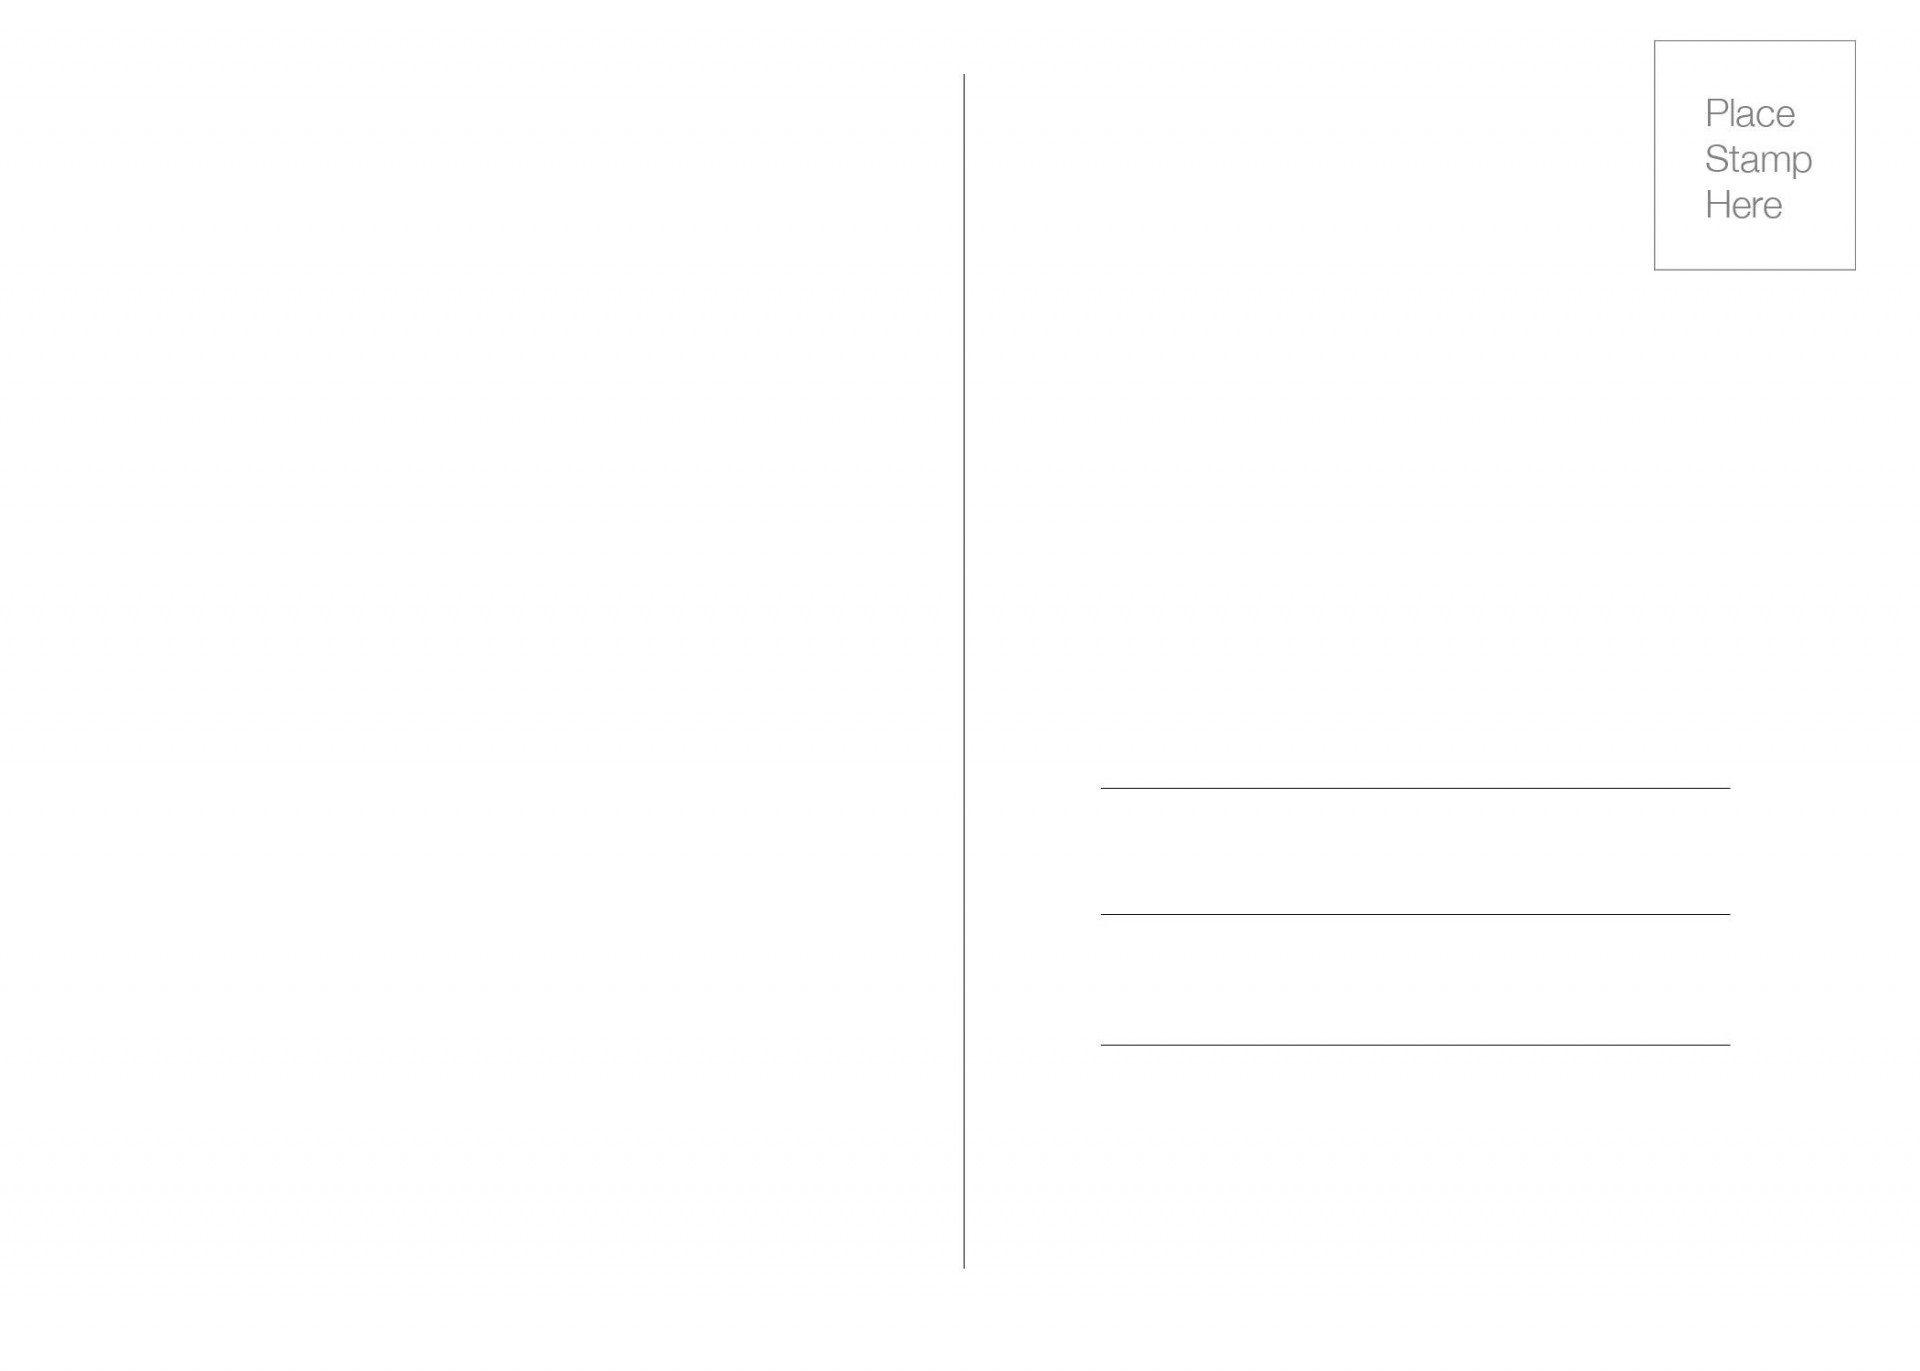 009 Dreaded 5 X 7 Postcard Template Microsoft Word Design Full